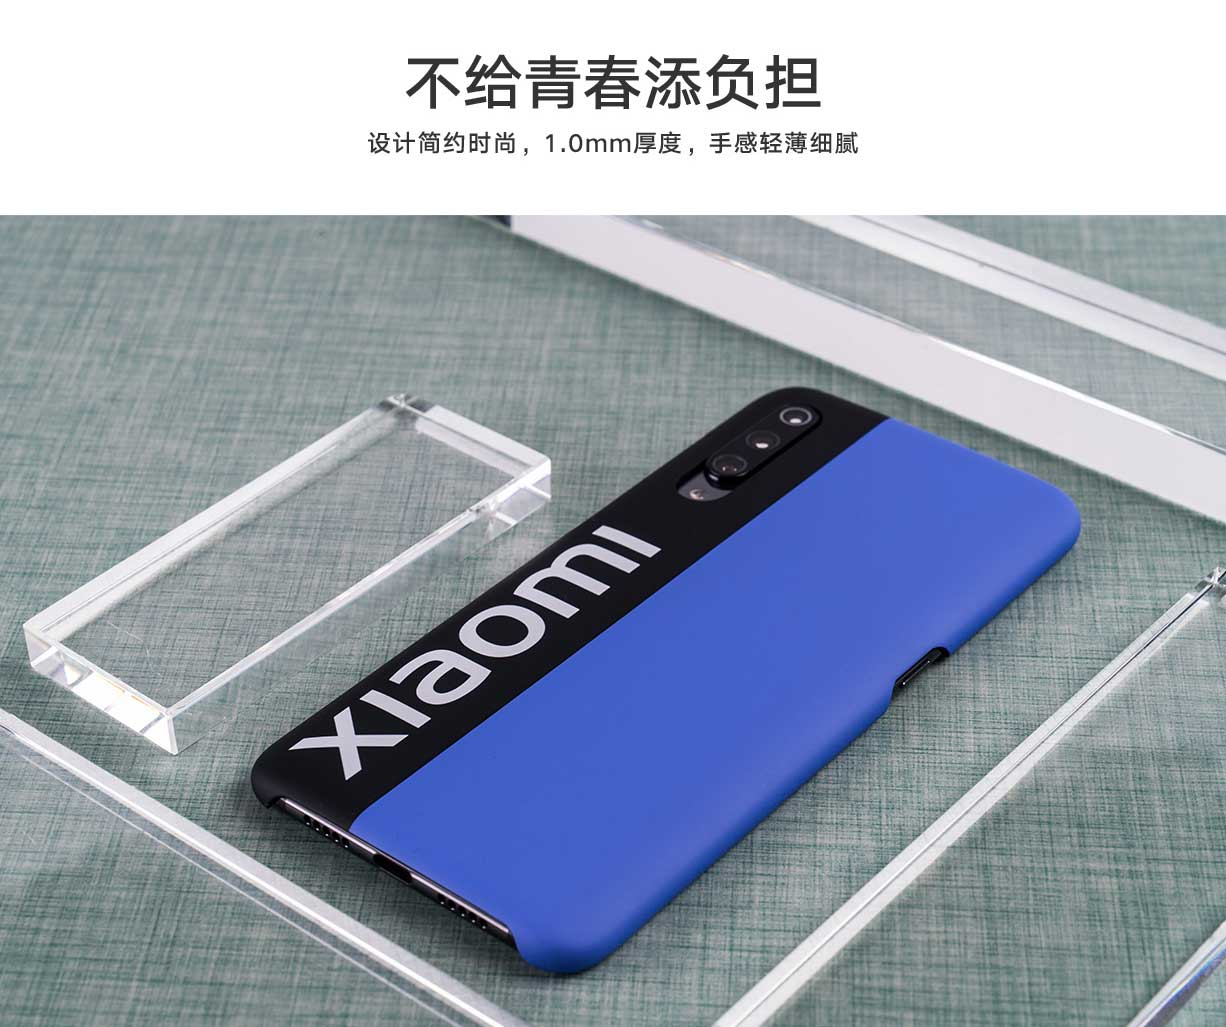 Coque pour Xiaomi Mi 9 - Officielle Xiaomi ()